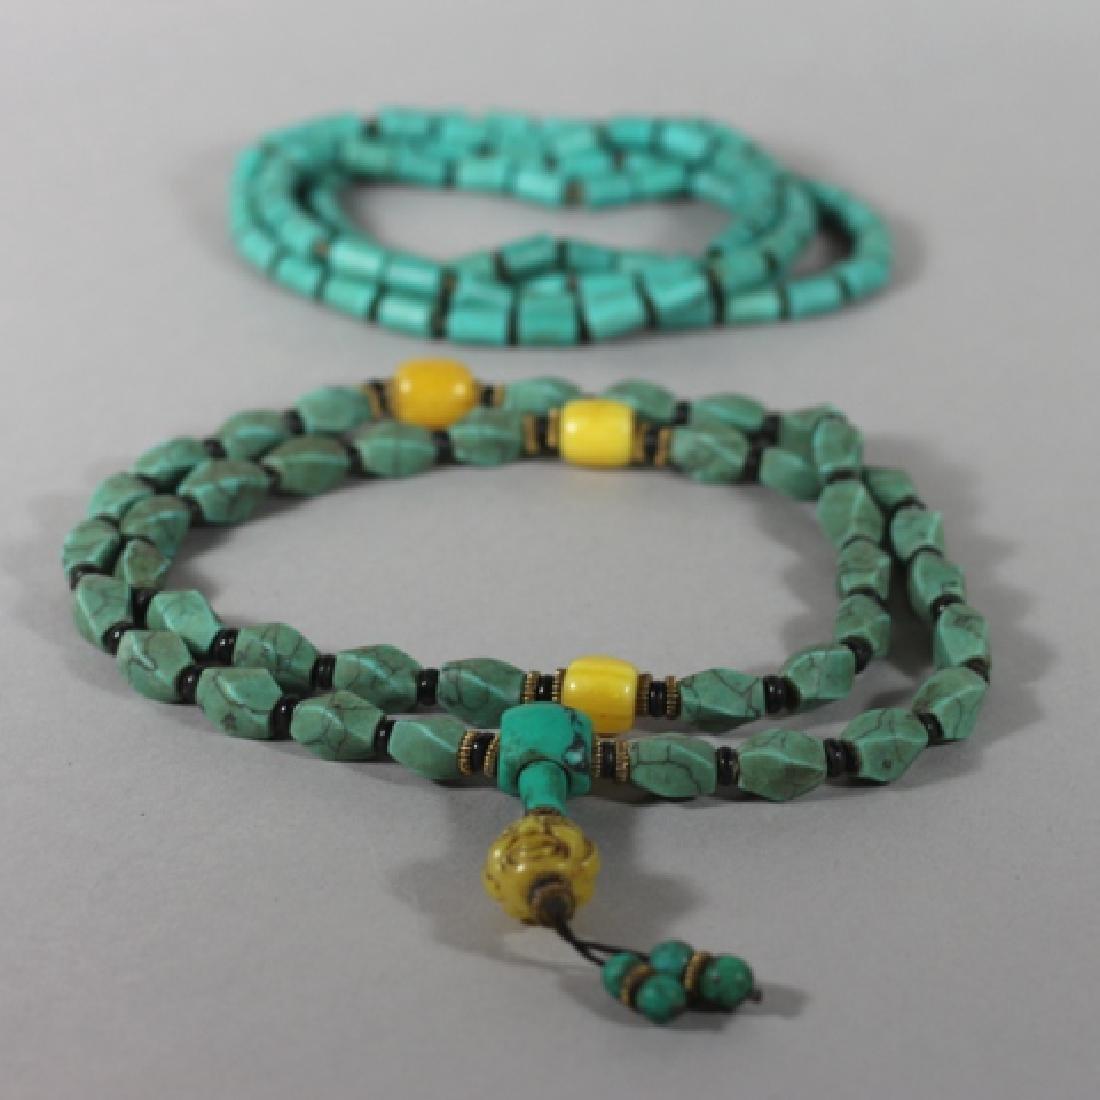 Tibetan Turquoise Mala Beads and Necklace